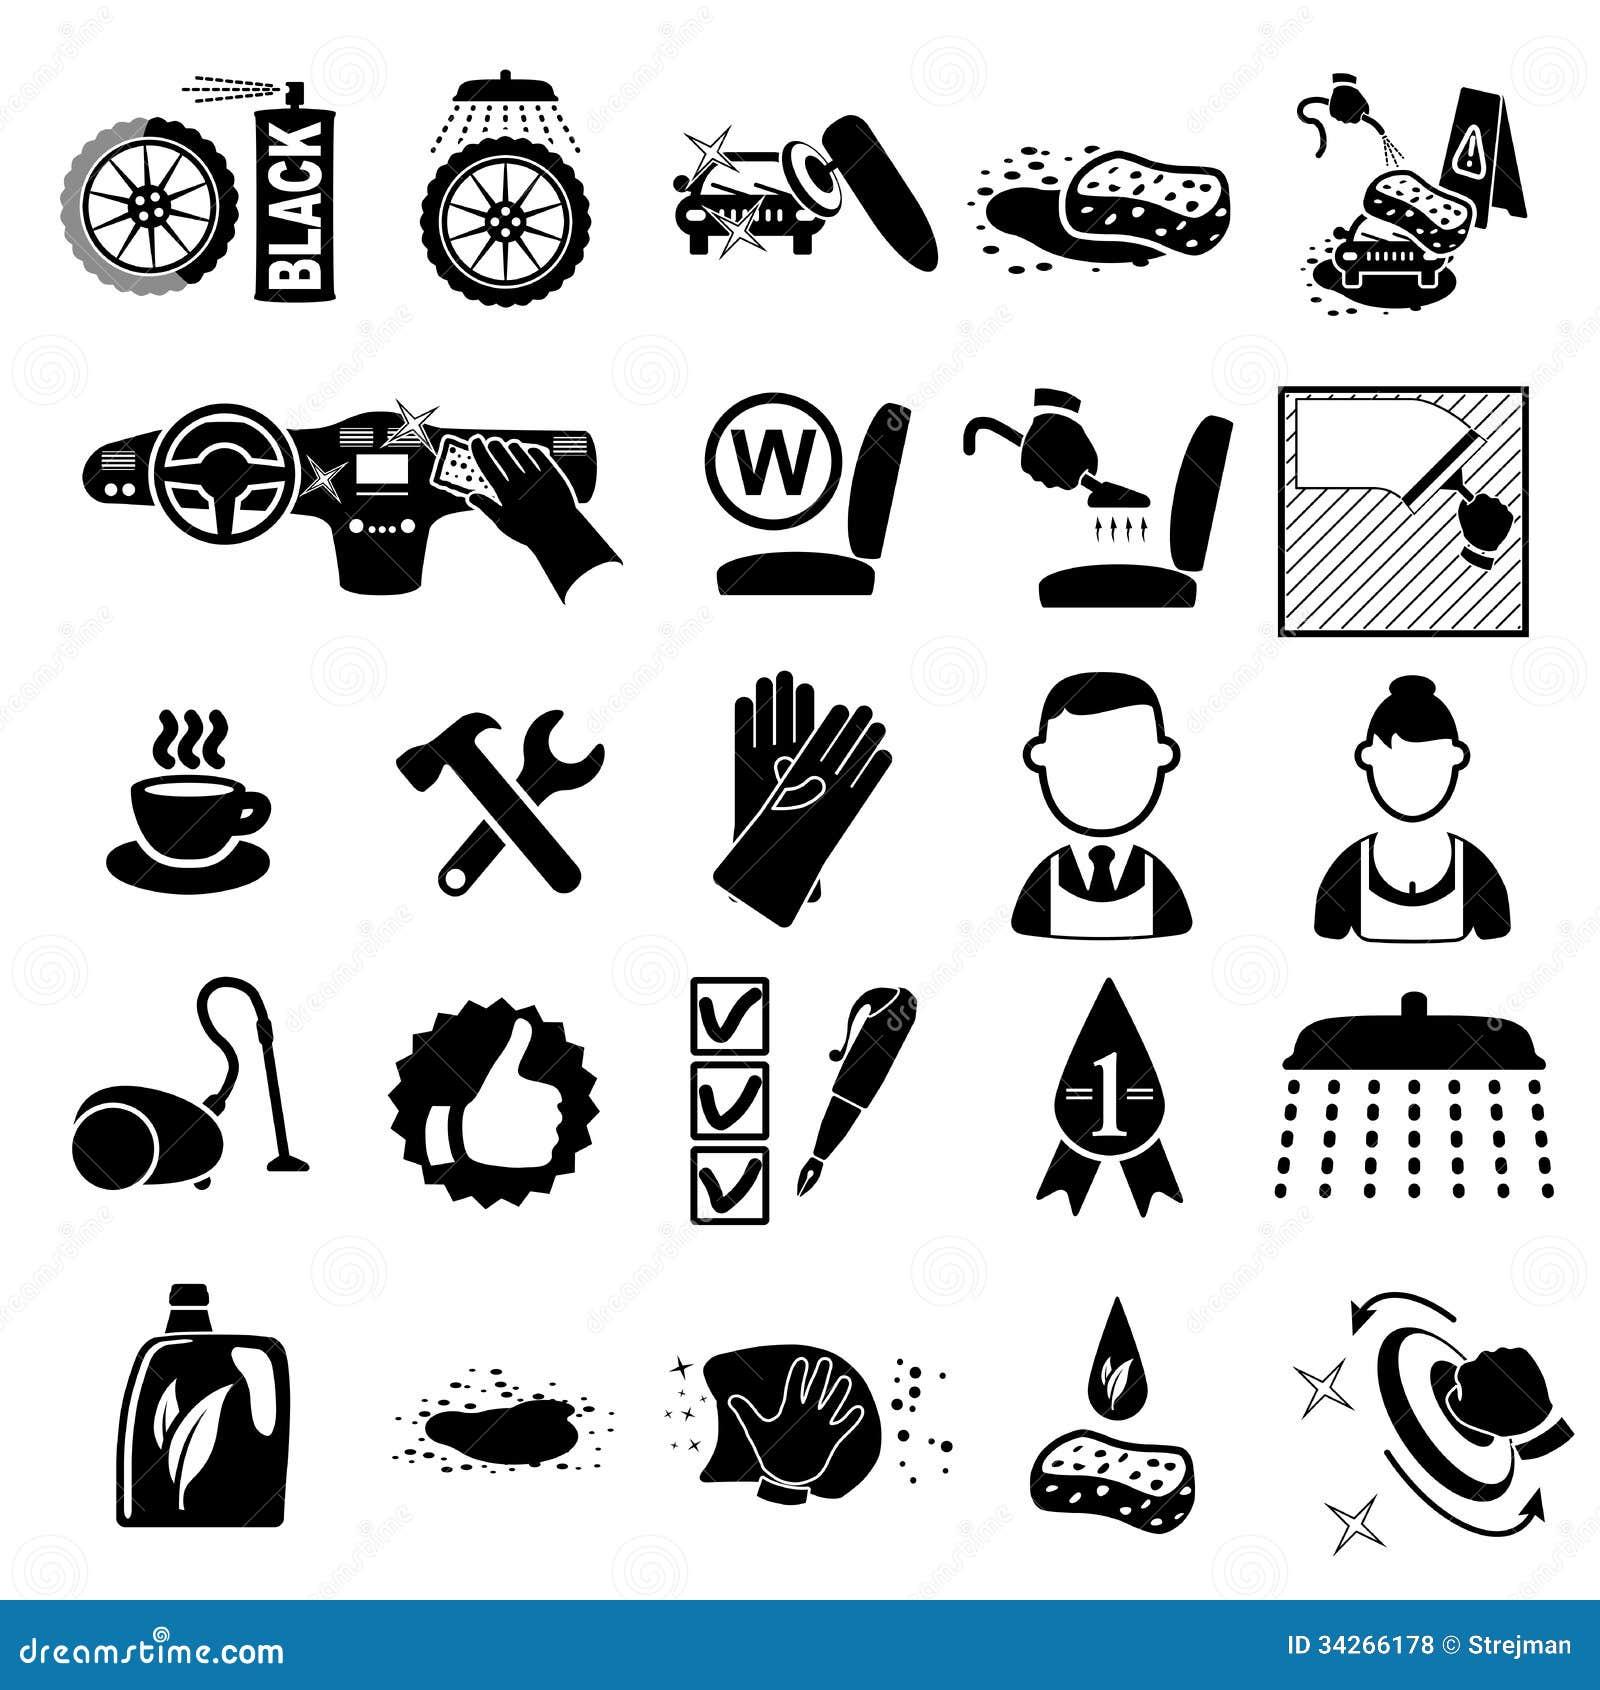 car wash icons set royalty free stock photos image 34266178 Car Vector Art Car Icon Vector